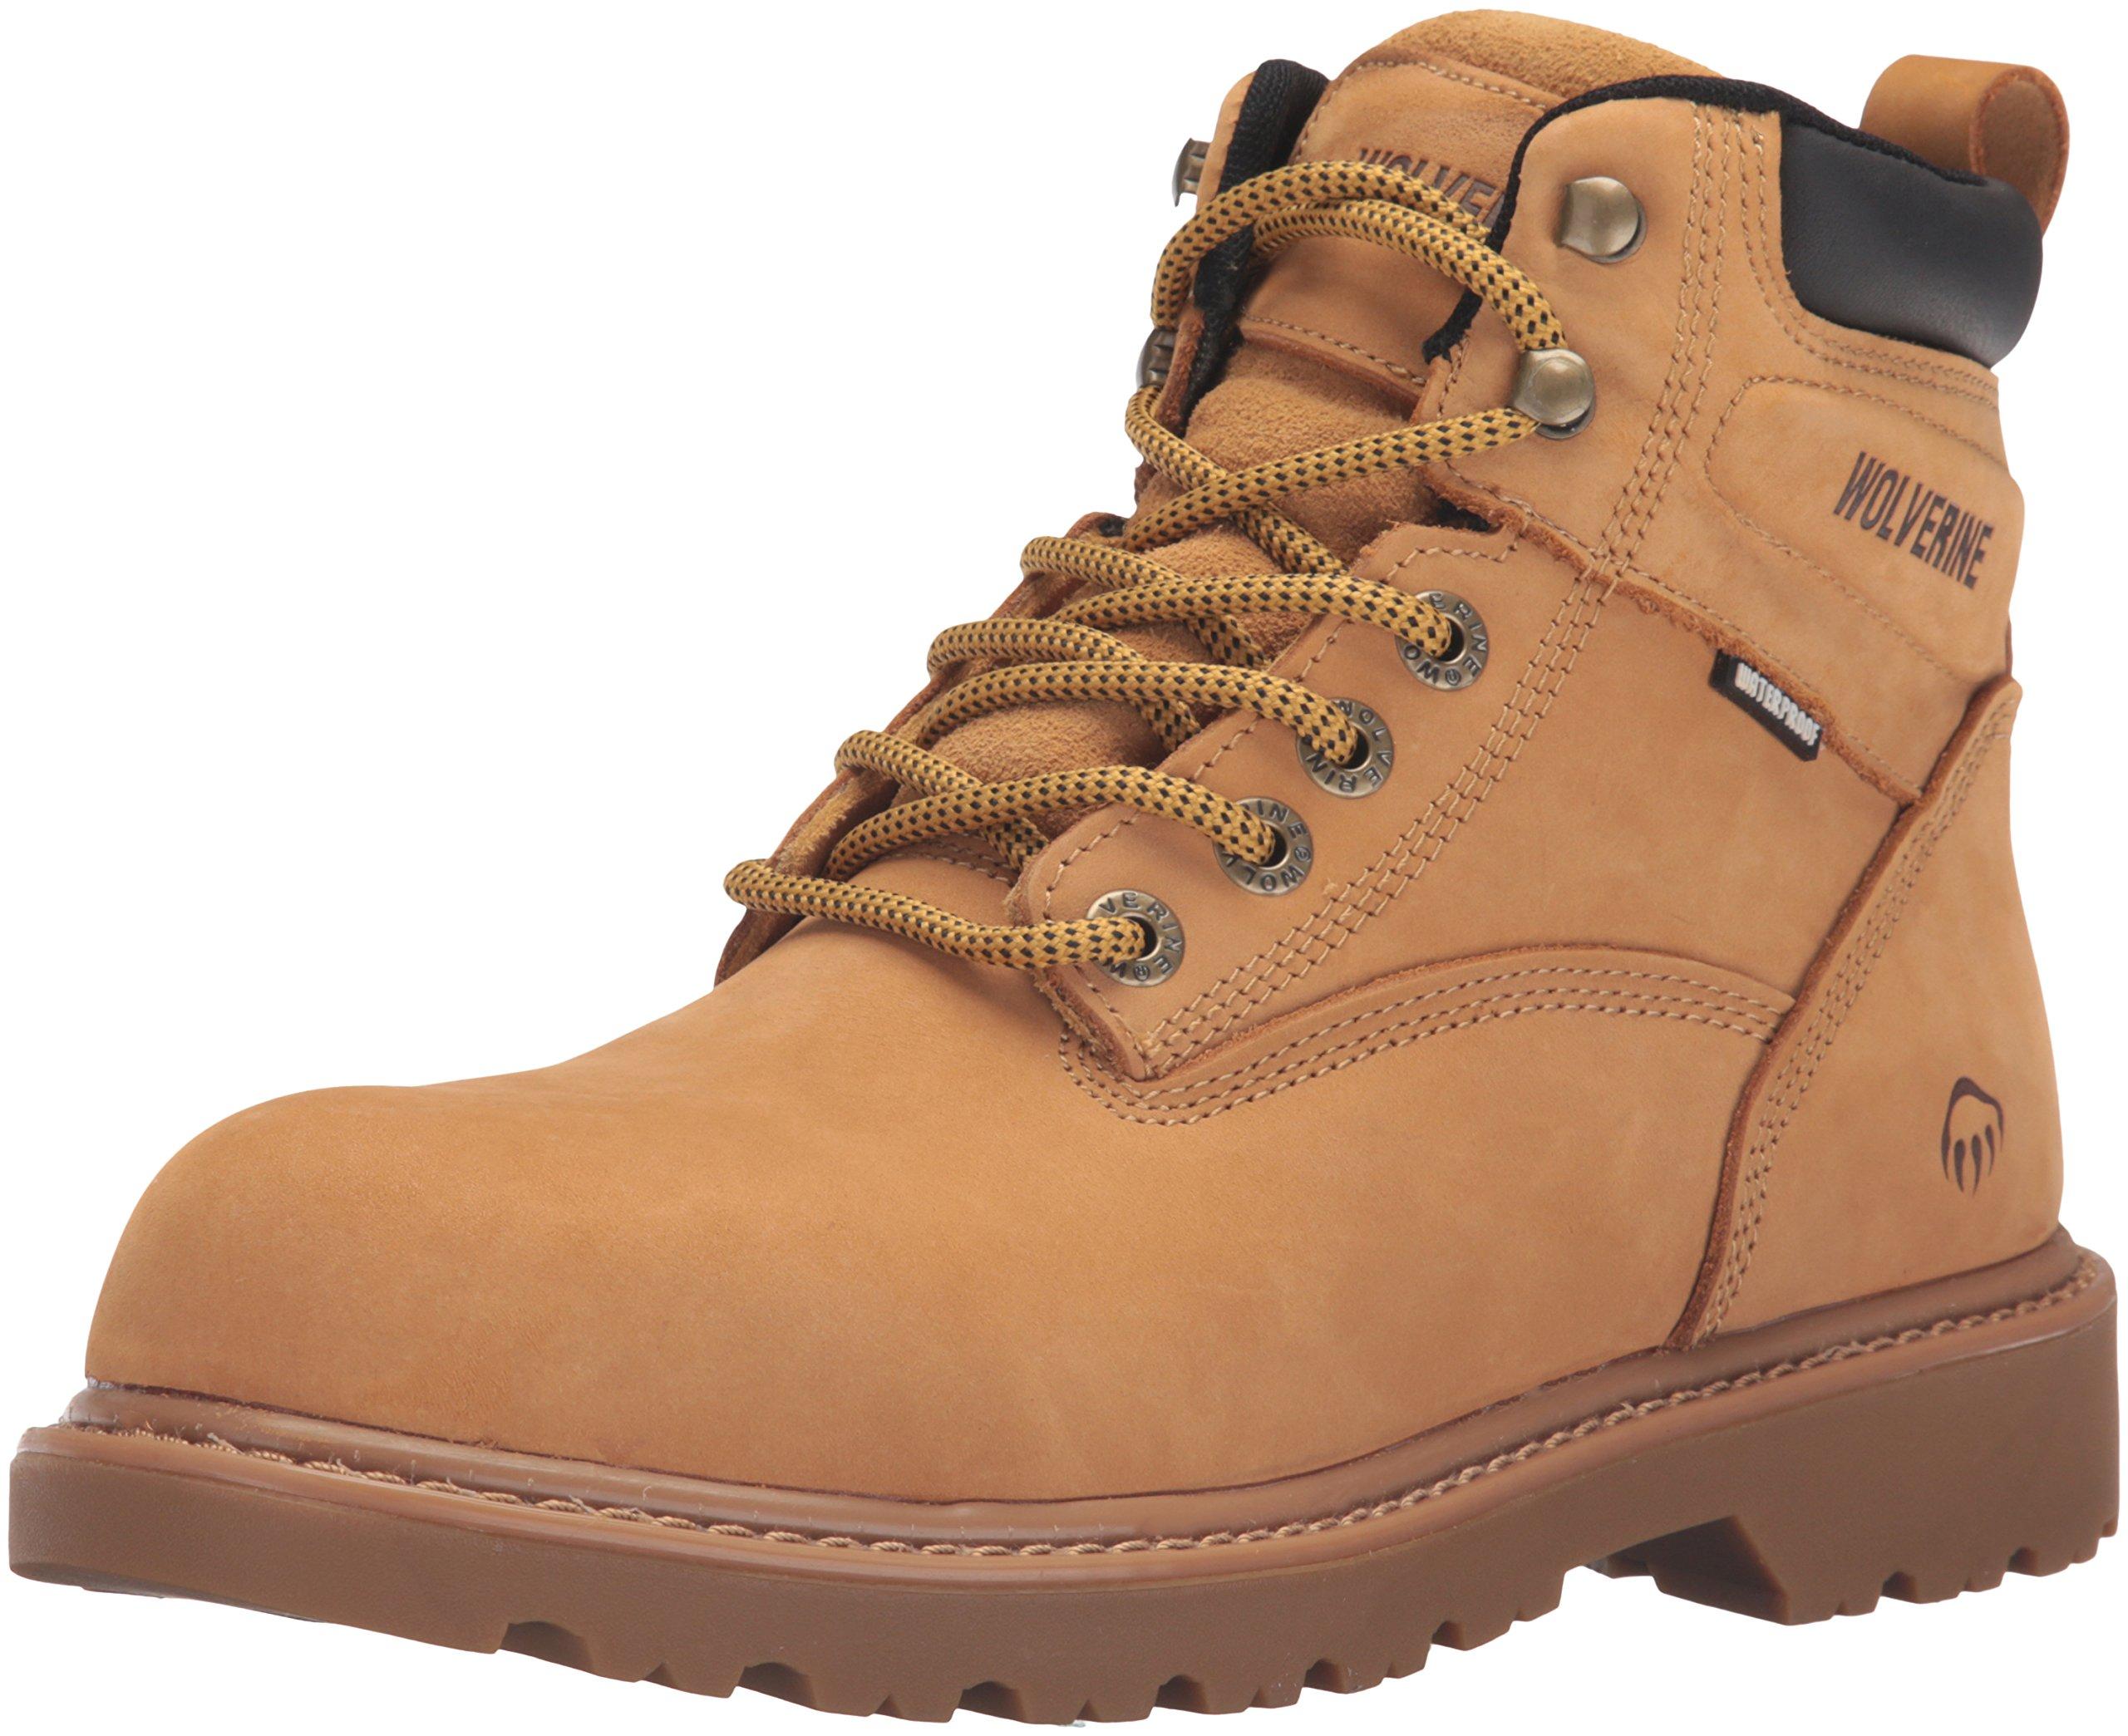 Wolverine Men's Floorhand 6 Inch Waterproof Soft Toe Work Shoe